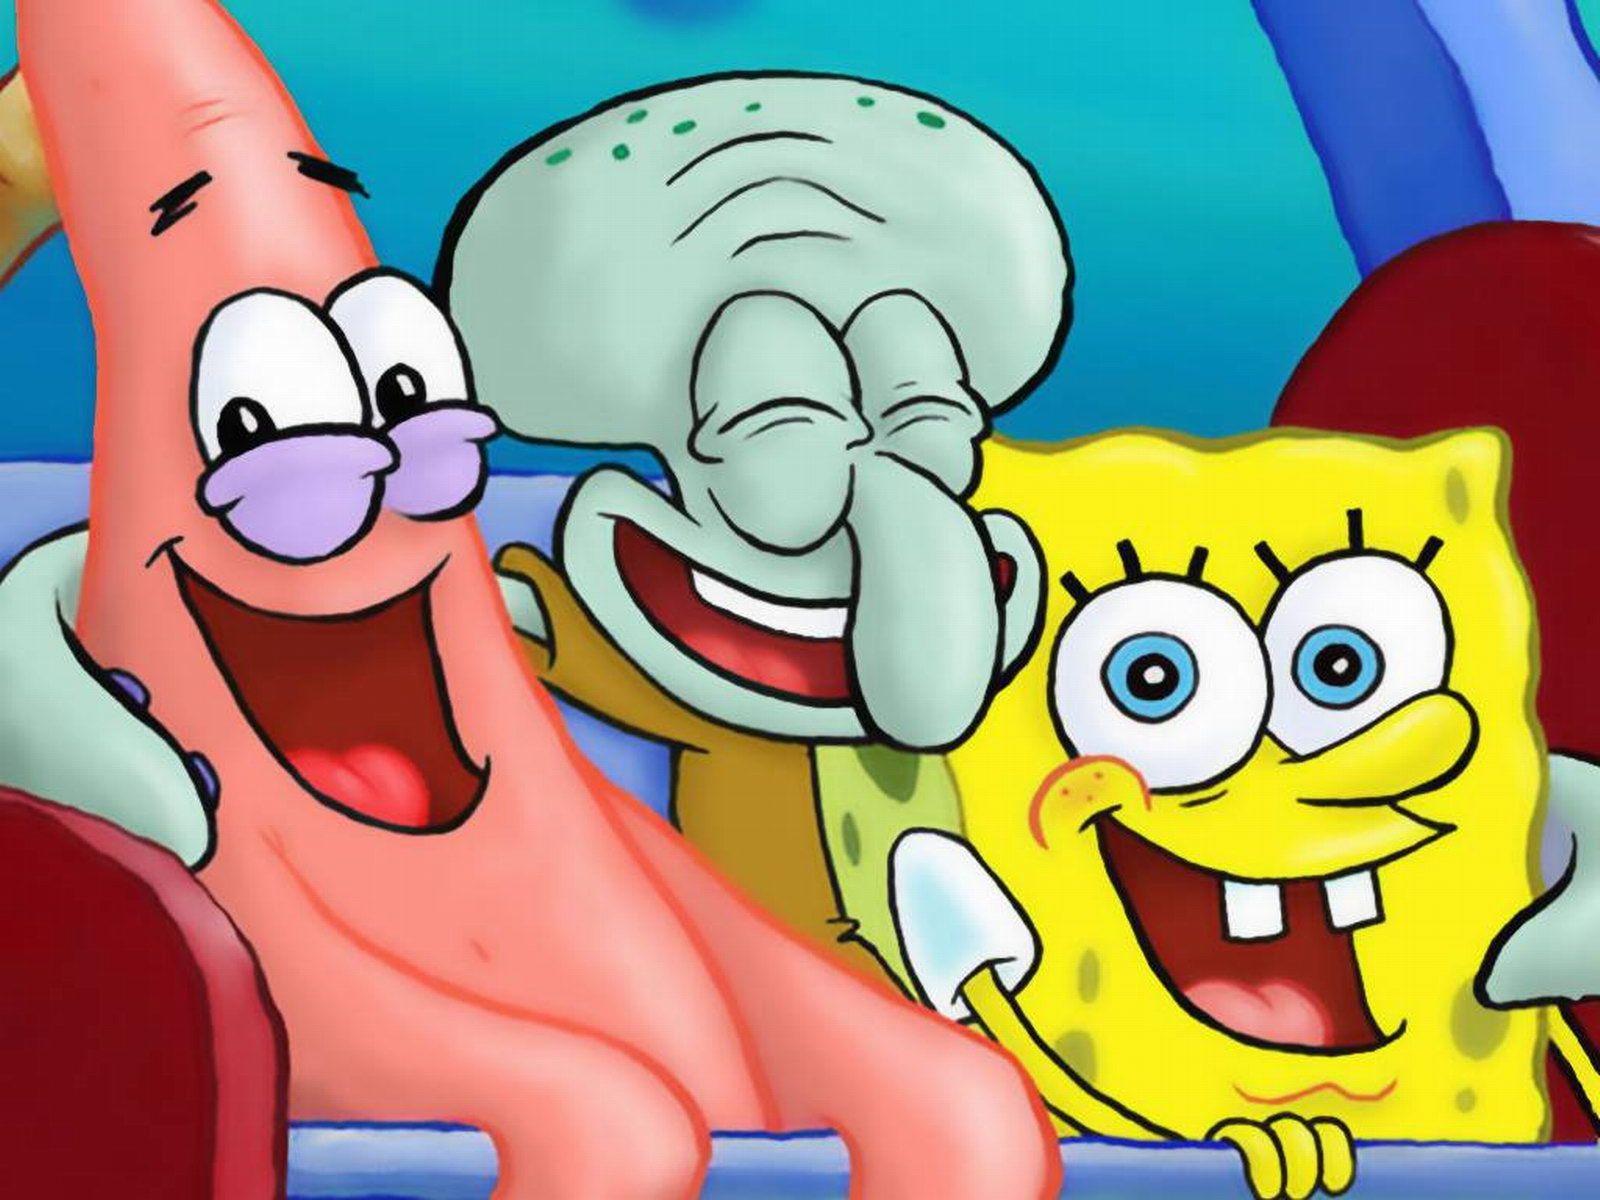 Uncategorized Spongebob And Squidward spongebob squarepants patrick star and squidward tentacles my tentacles